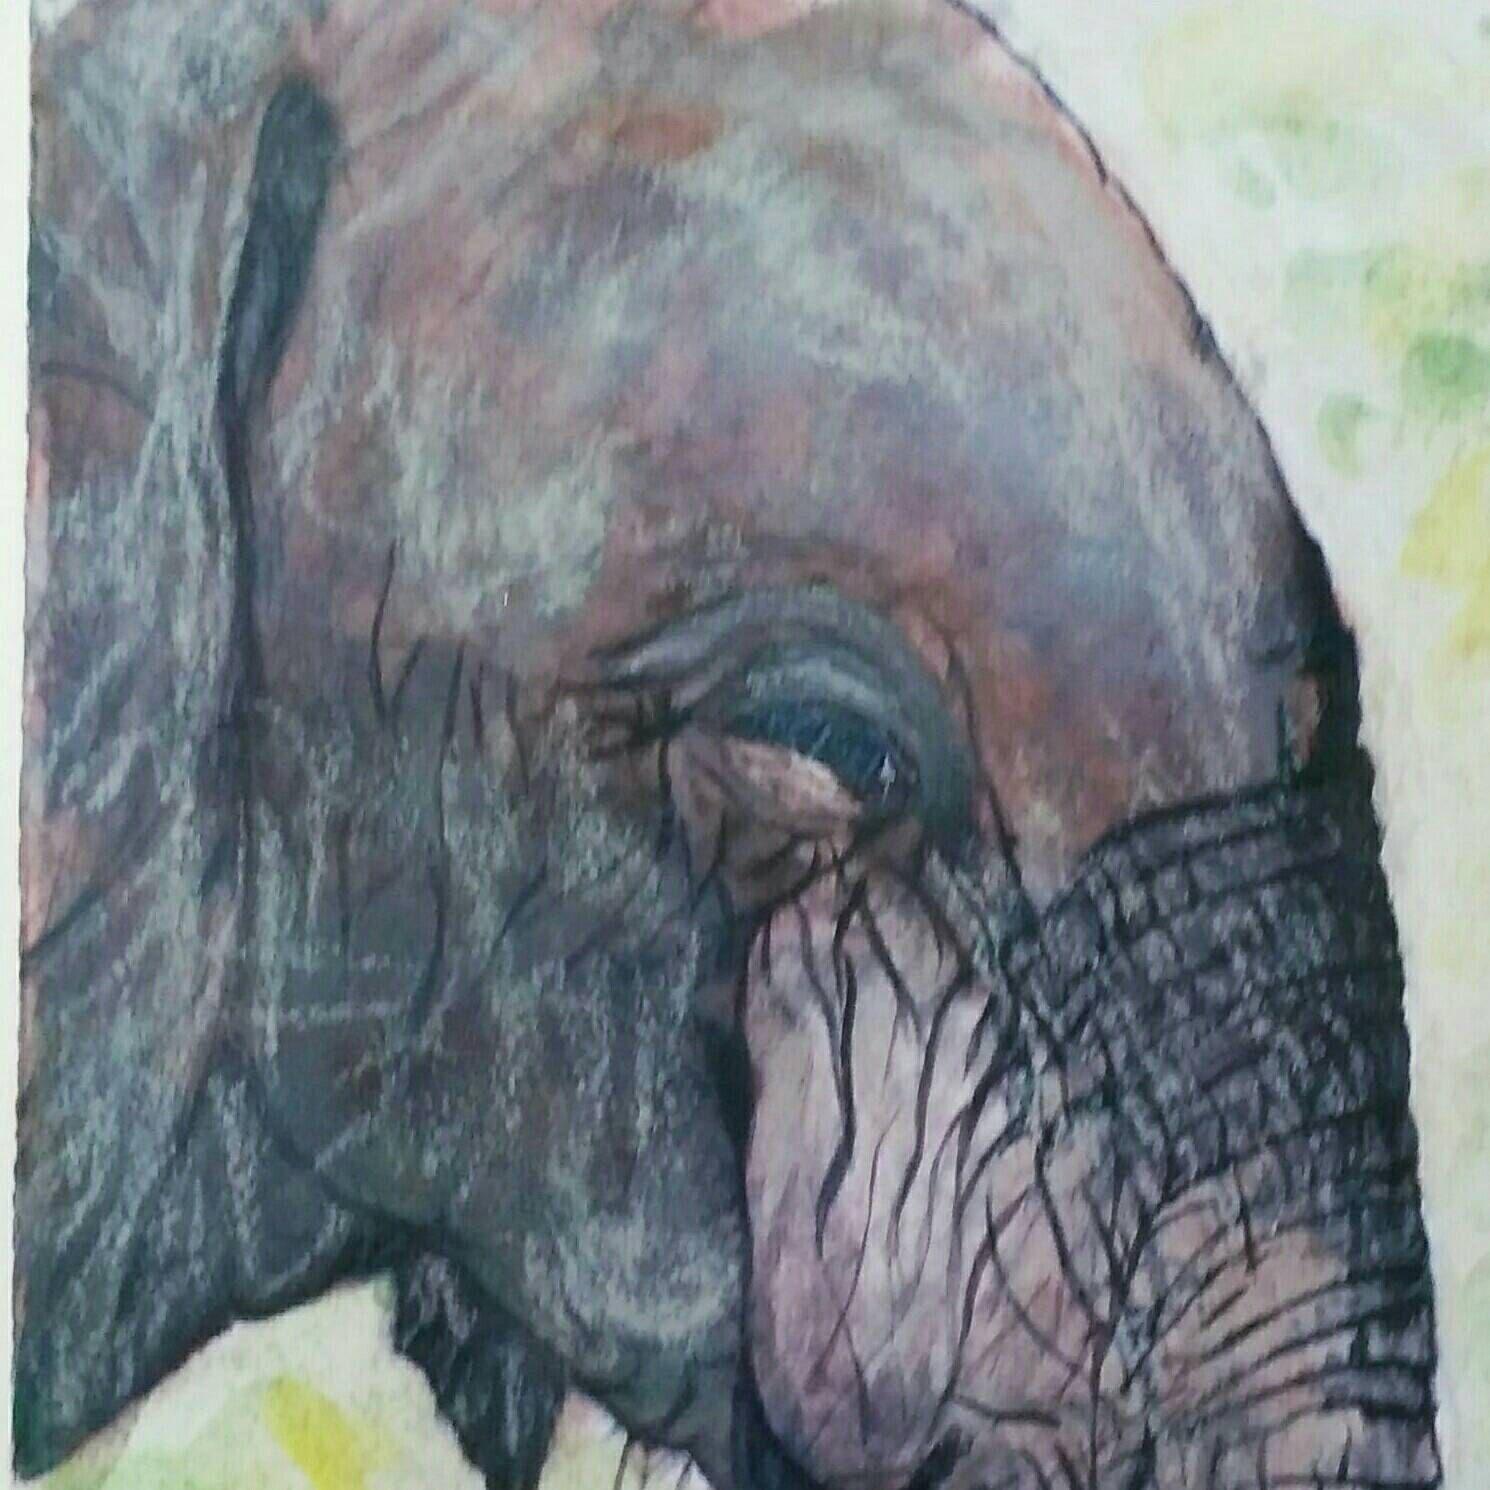 Christmas Cruelty 2020 Elephant True Beauty is Cruelty free painting Christmas Gift